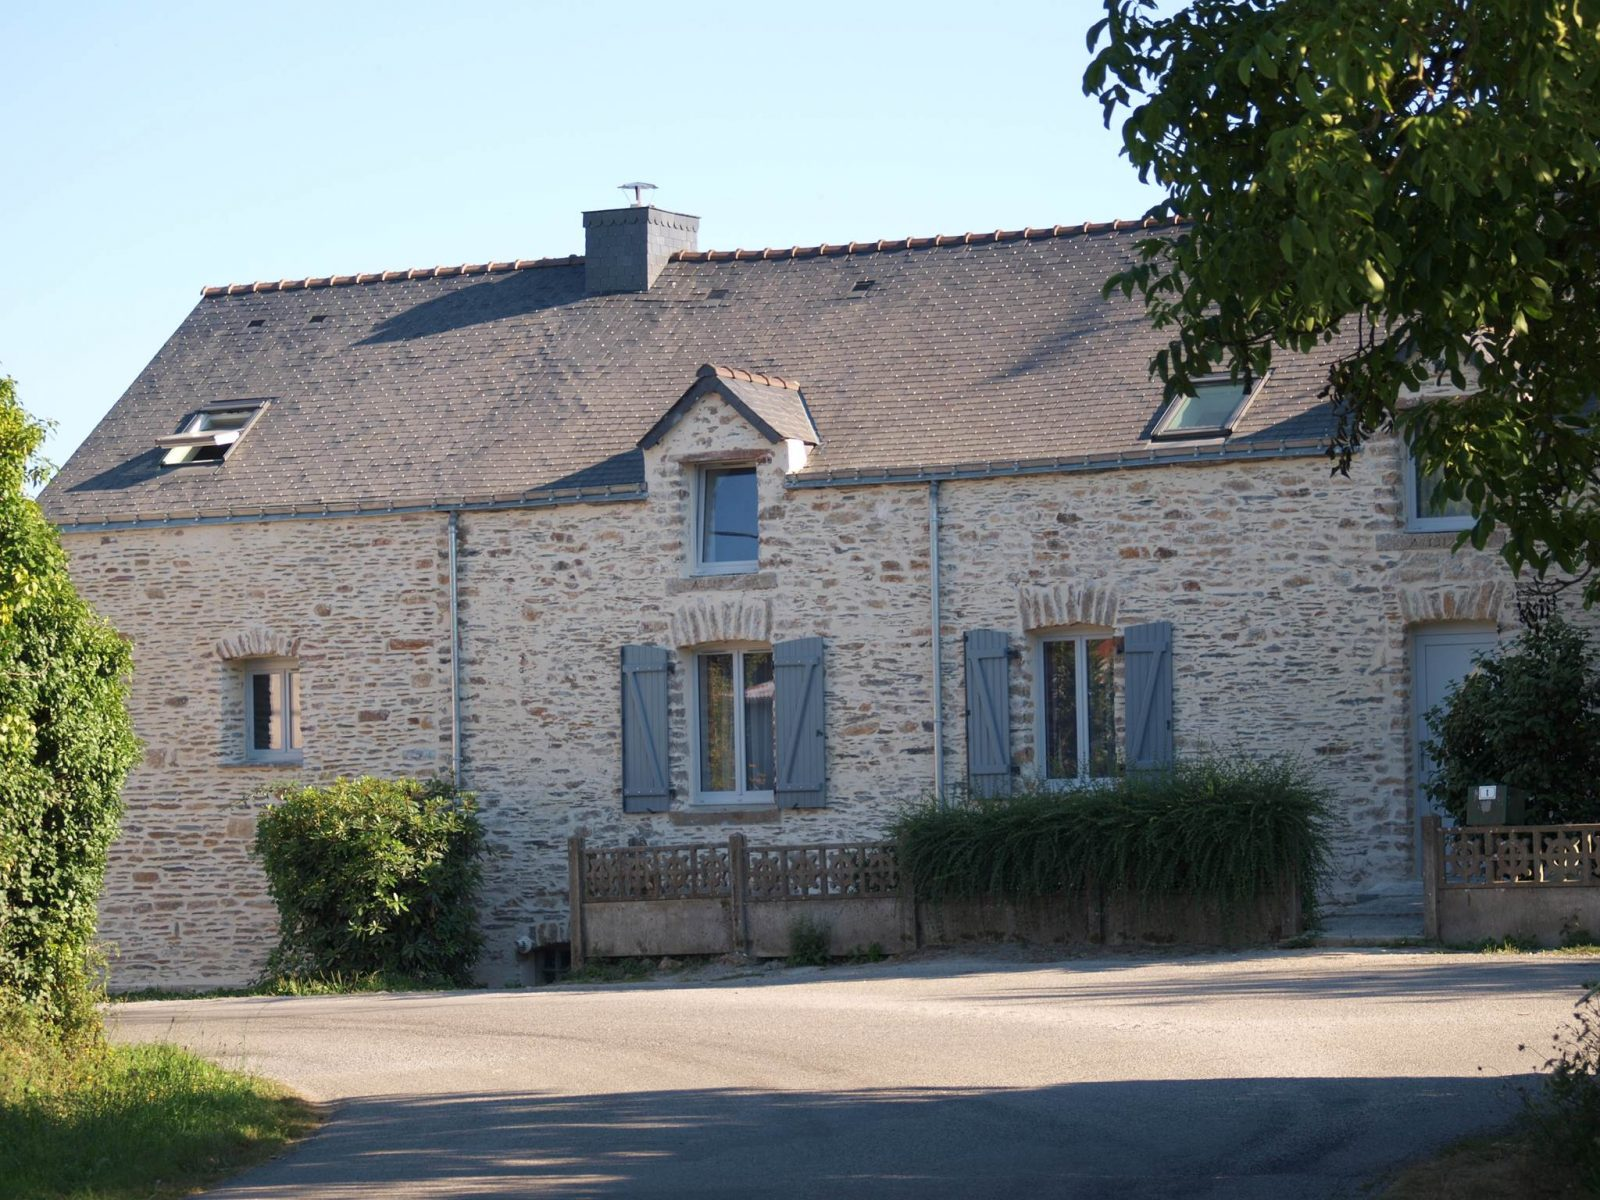 chambre d'hote-Takacs-salon-St Dolay-Tourisme Arc Sud Bretagne